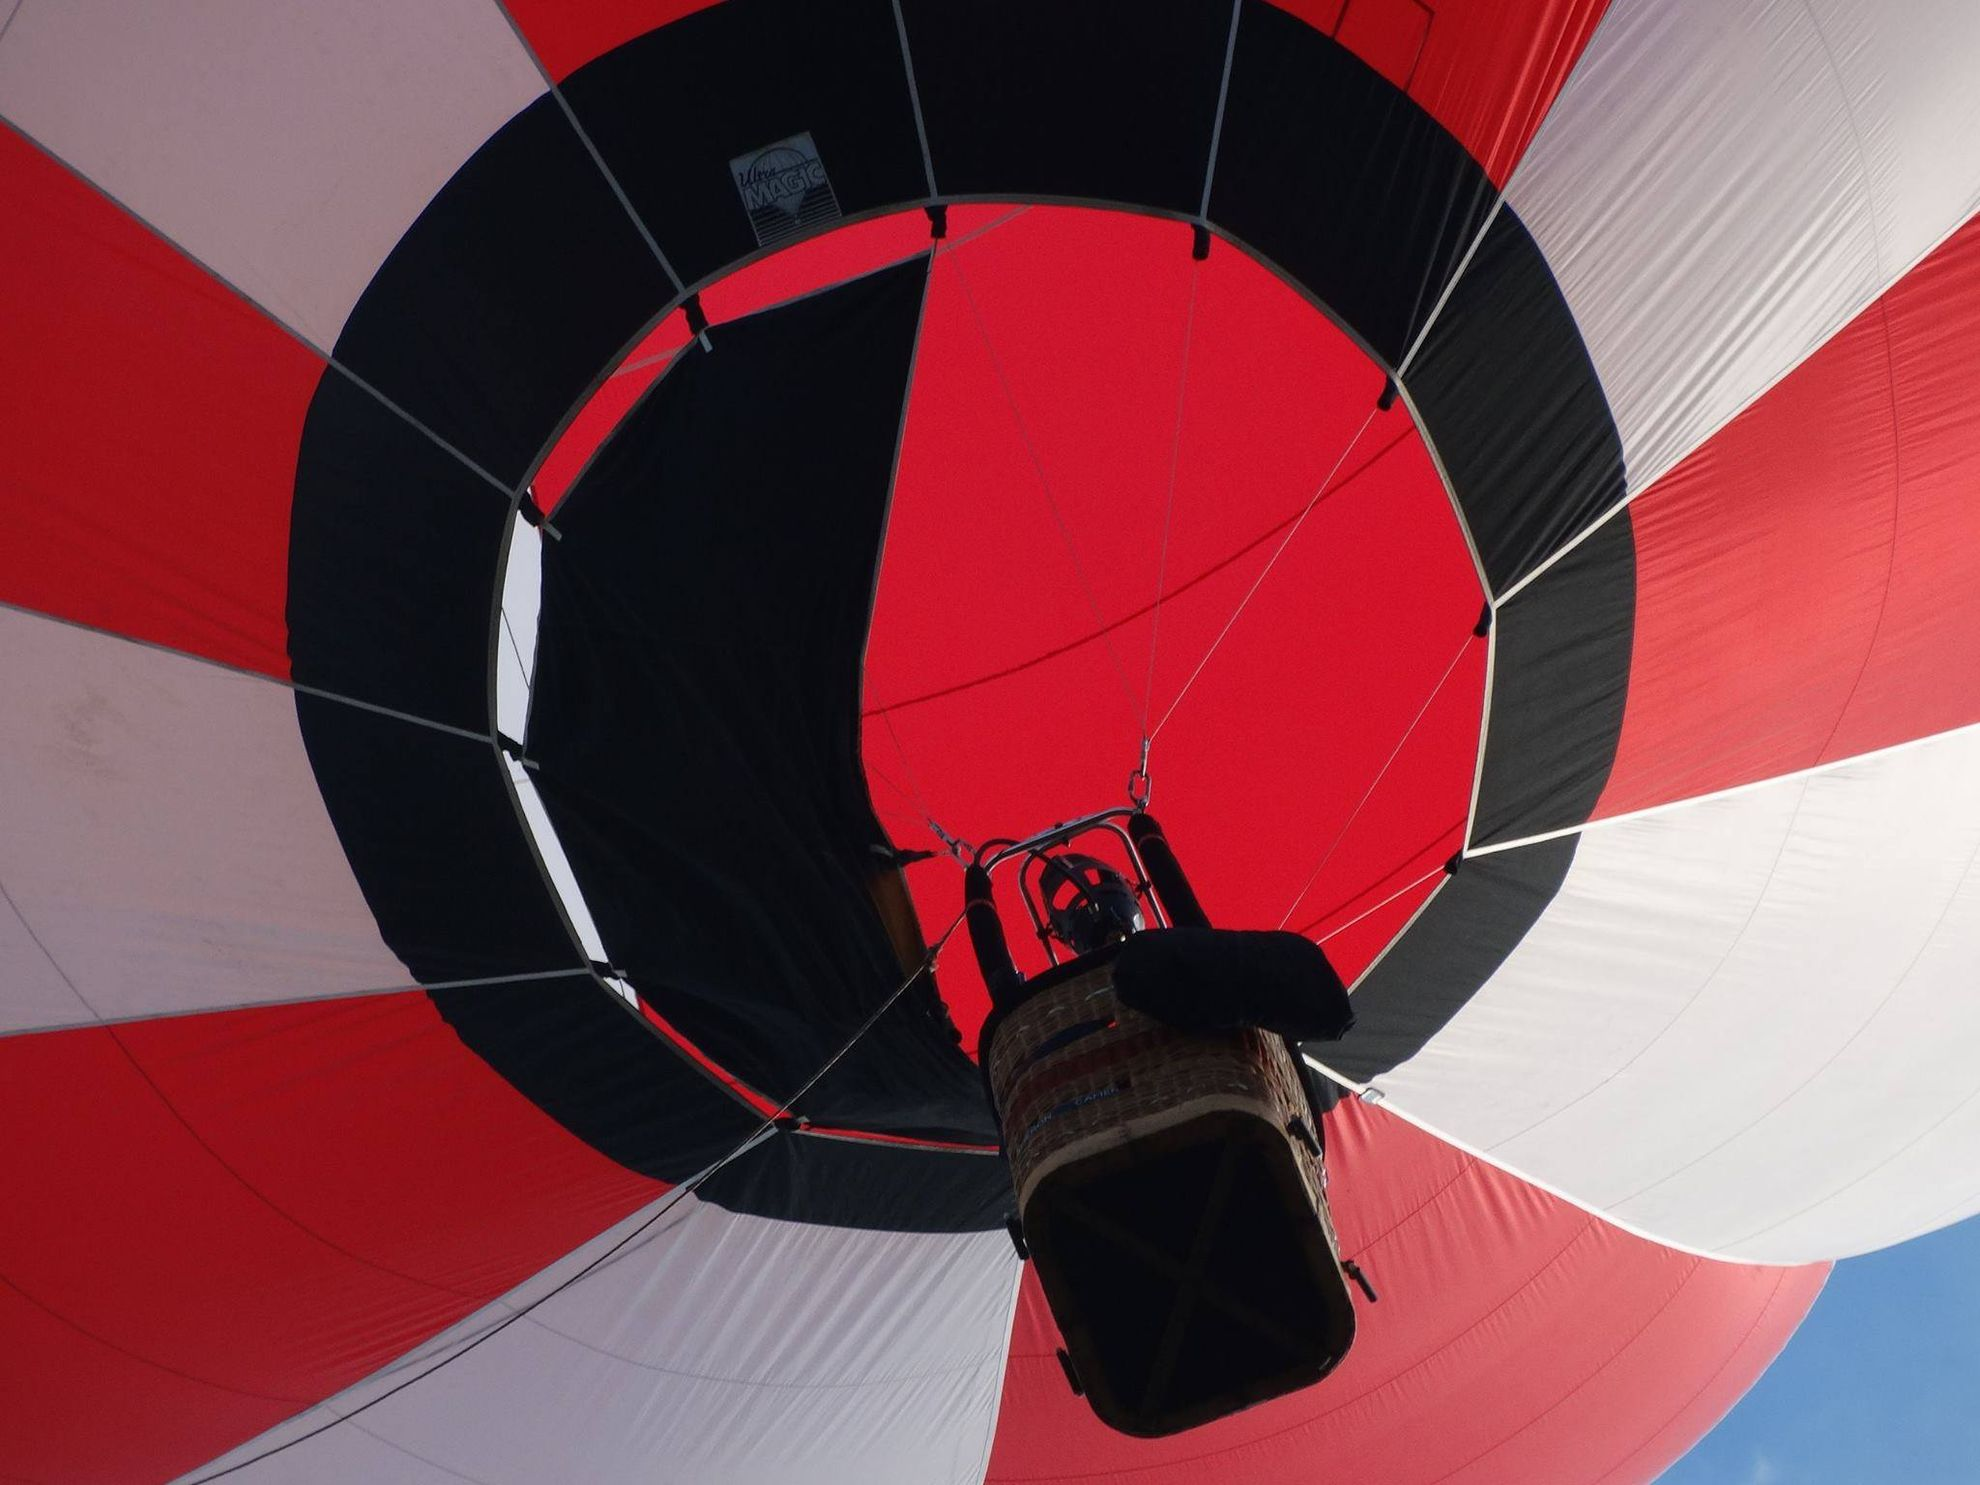 Strathaven Ballon Festival